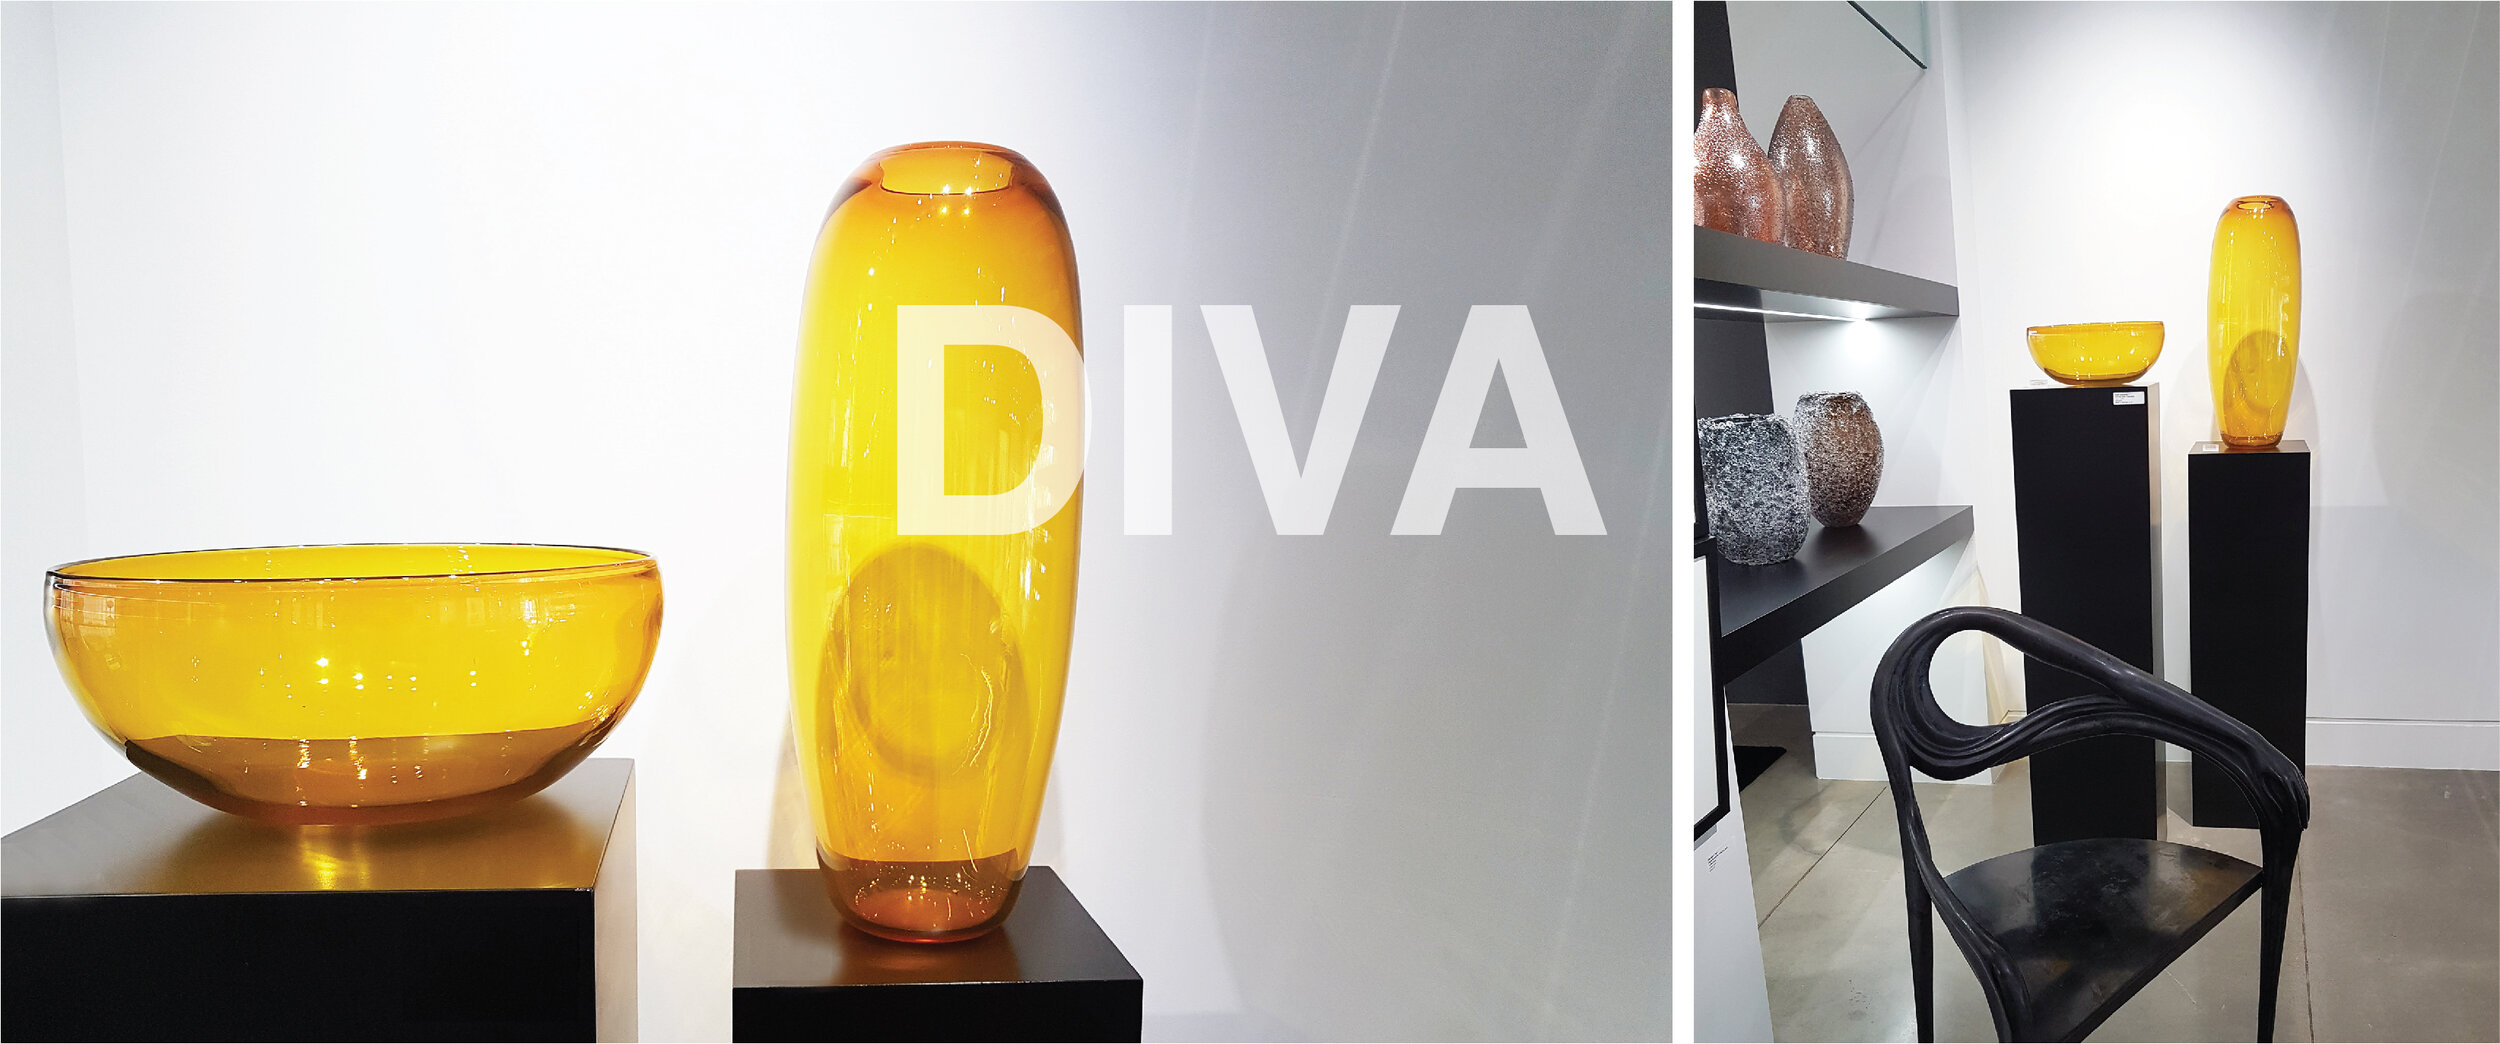 DivaFB.jpg